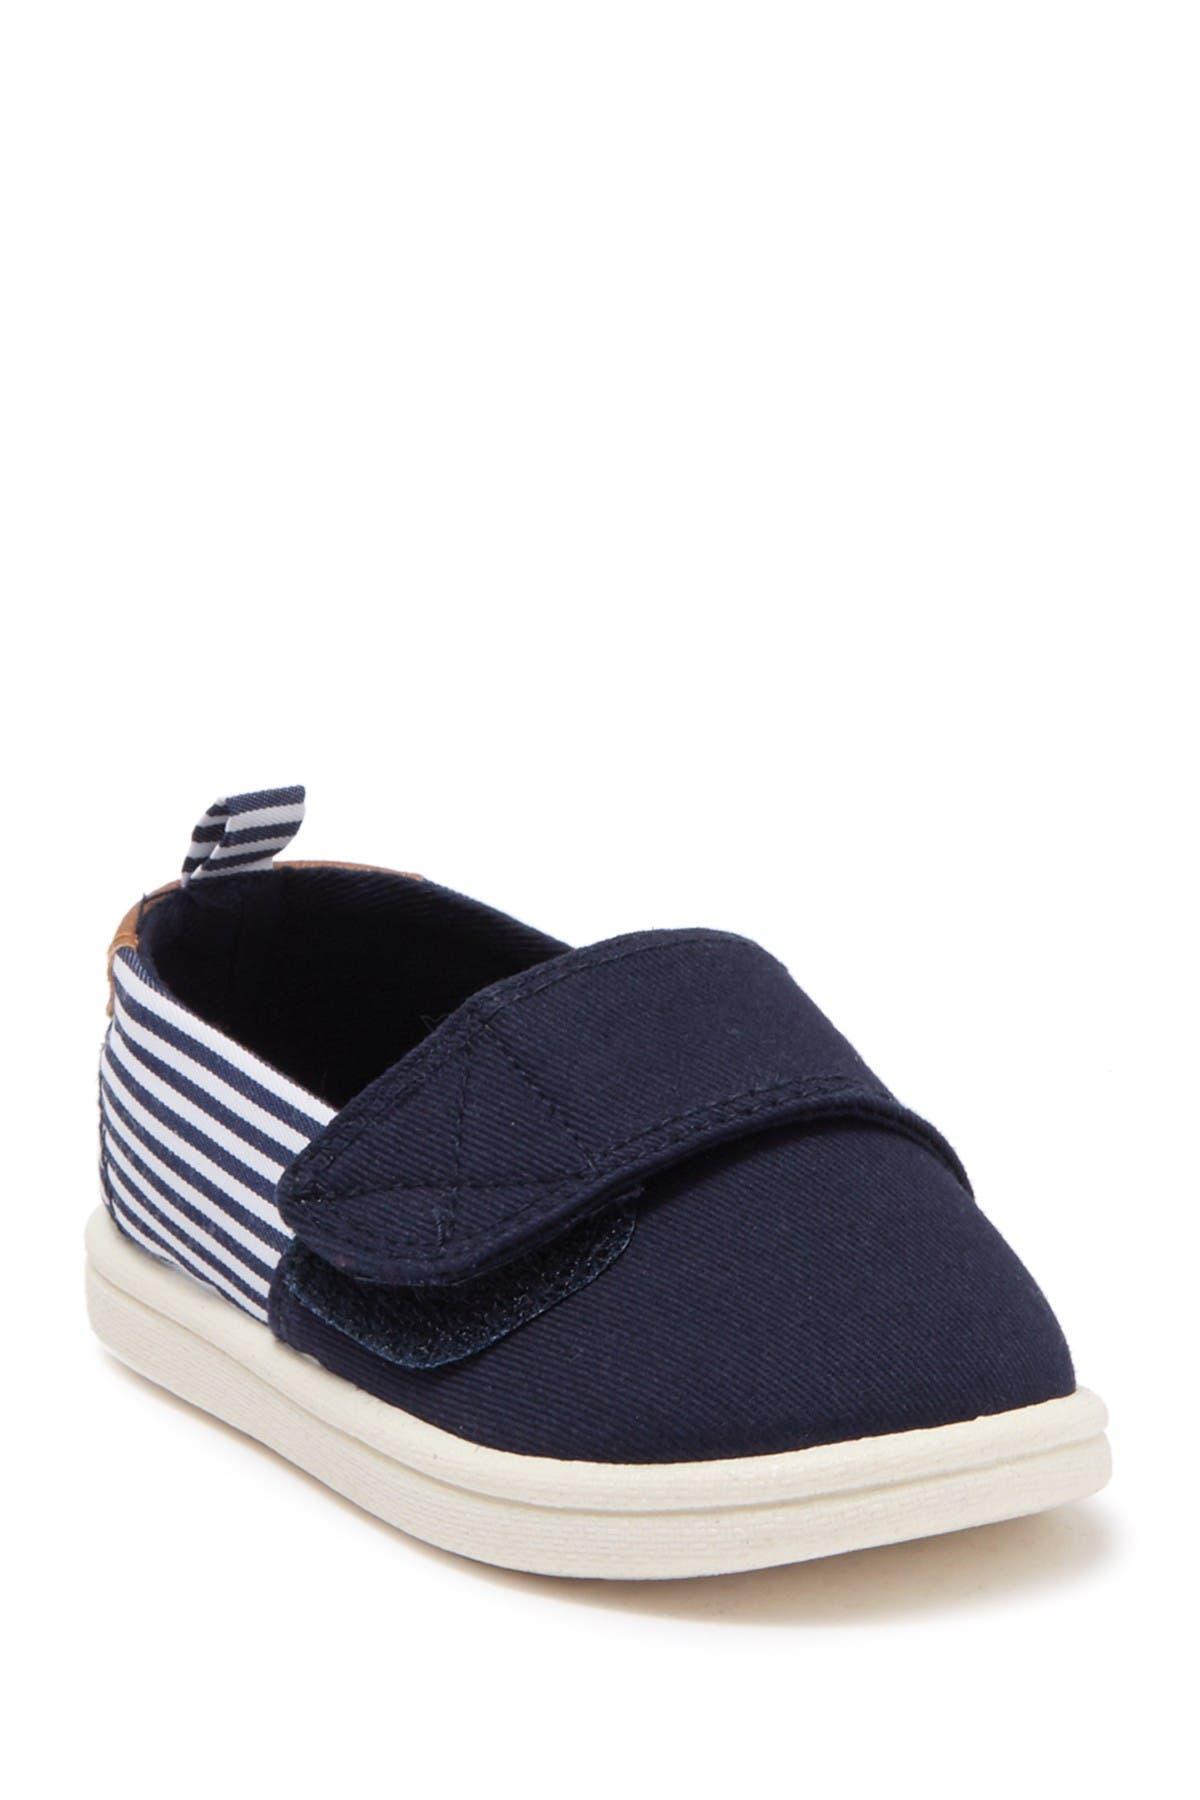 Image of Joe Fresh Padou Slip-On Sneaker